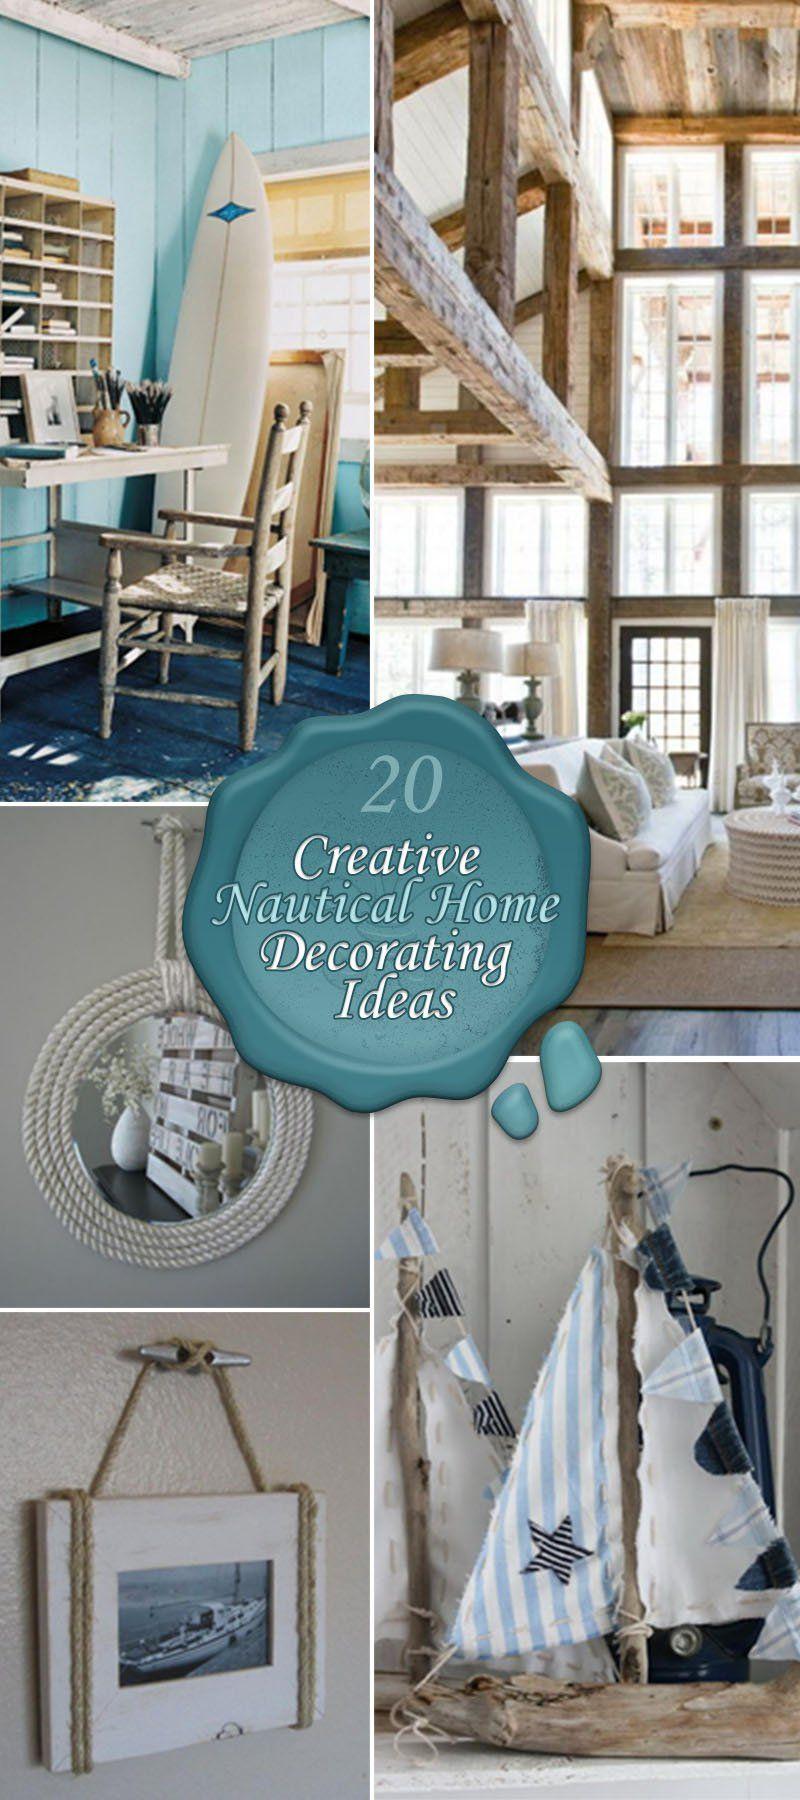 Perfect 20 Very Creative Nautical Home Decorating Ideas.